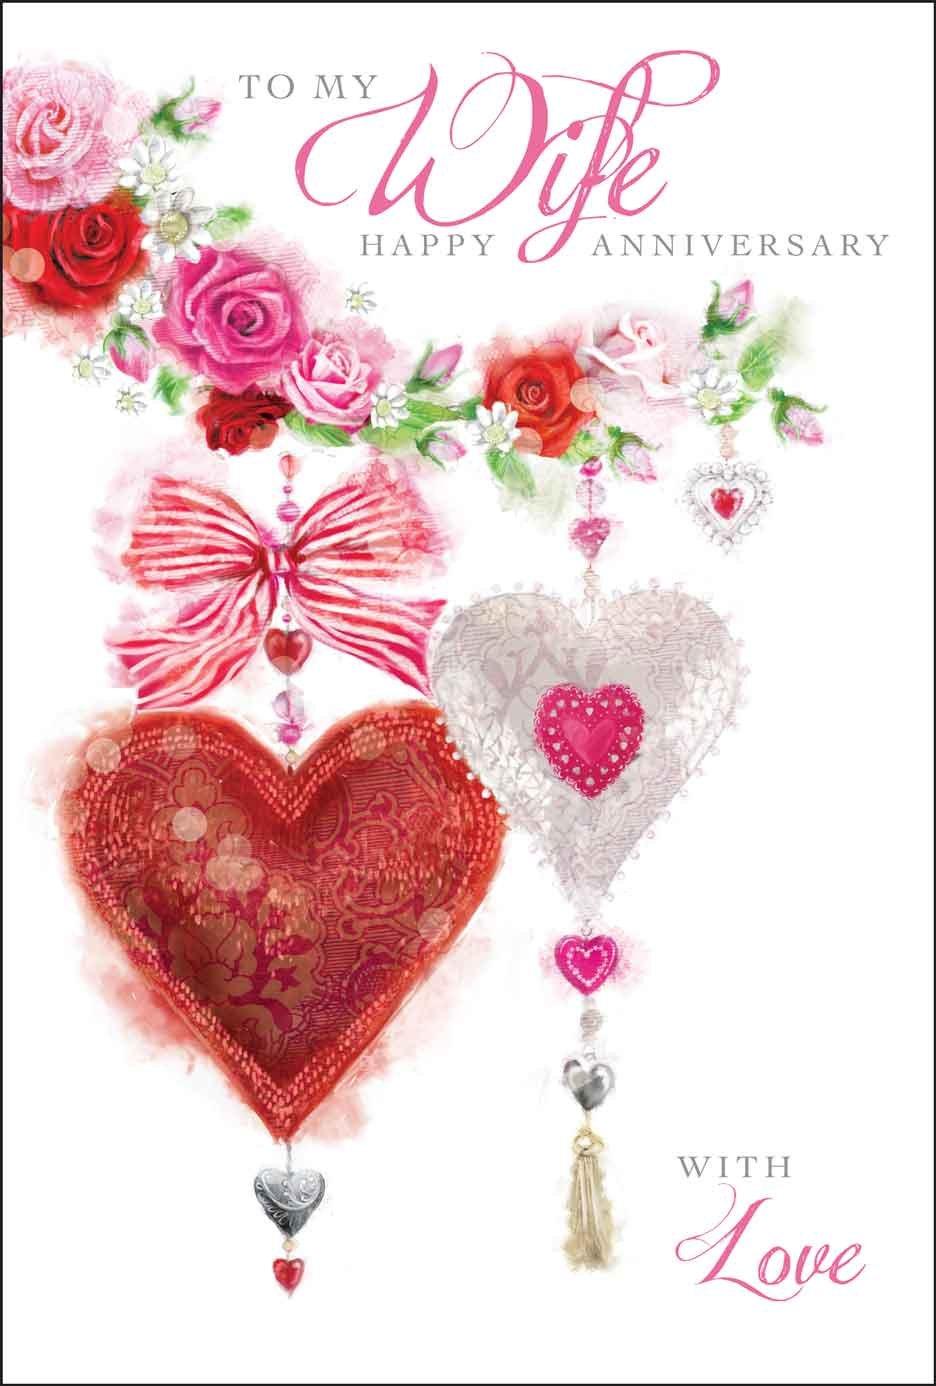 Jonny Javelin Love Hearts Wife Wedding Anniversary Card Amazon